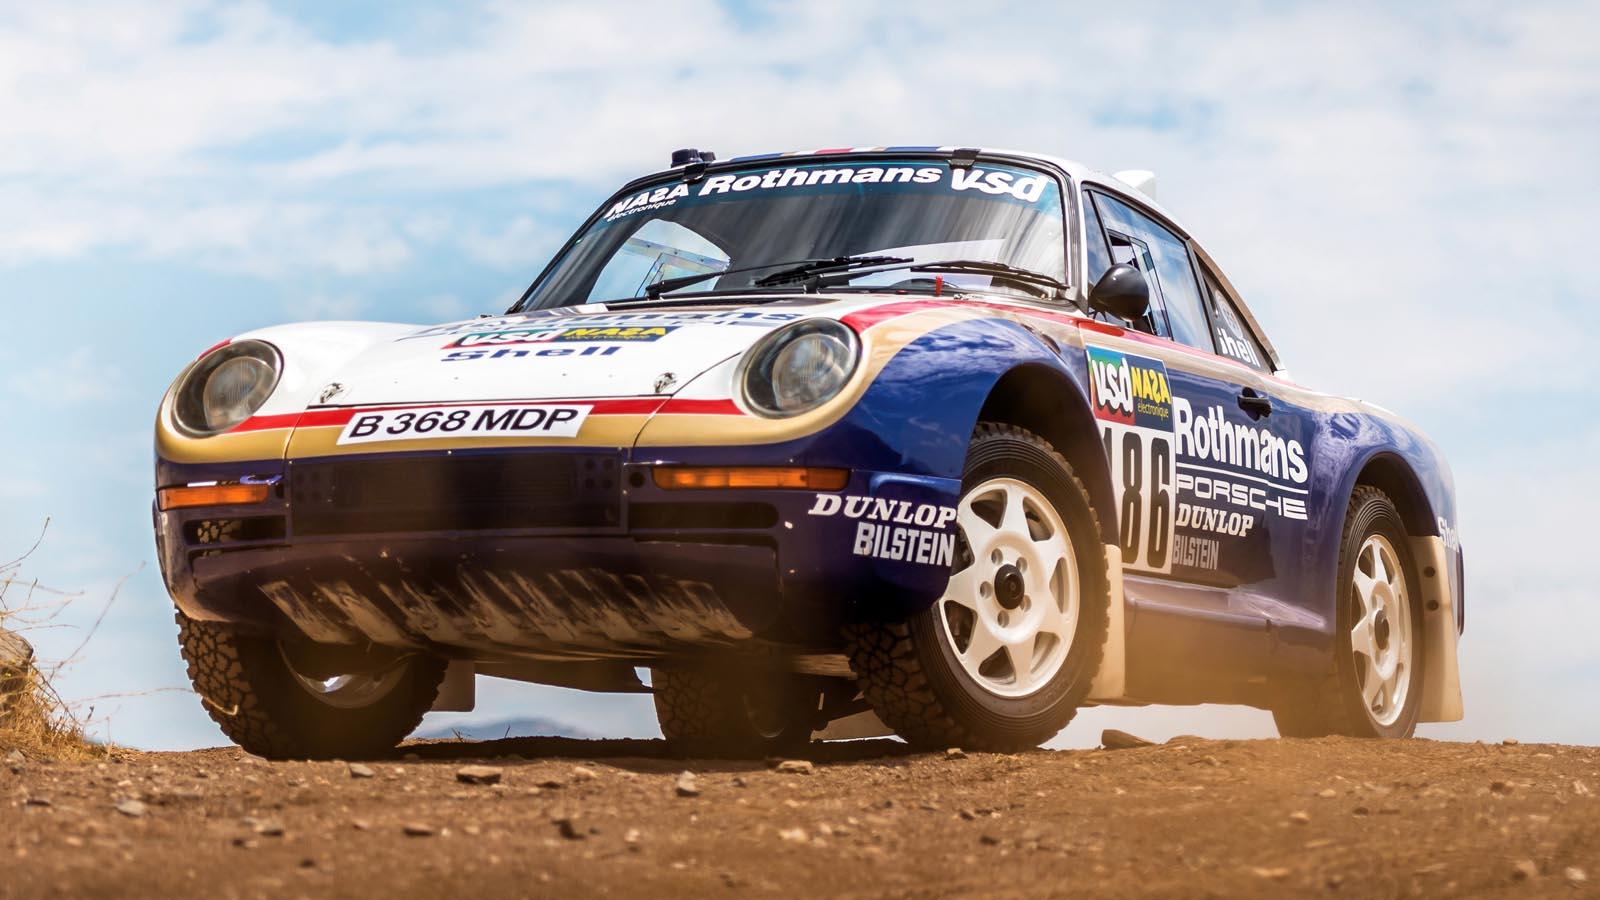 Photo of Δημοπρατείται μία Porsche 959 με συμμετοχή στο Paris-Dakar